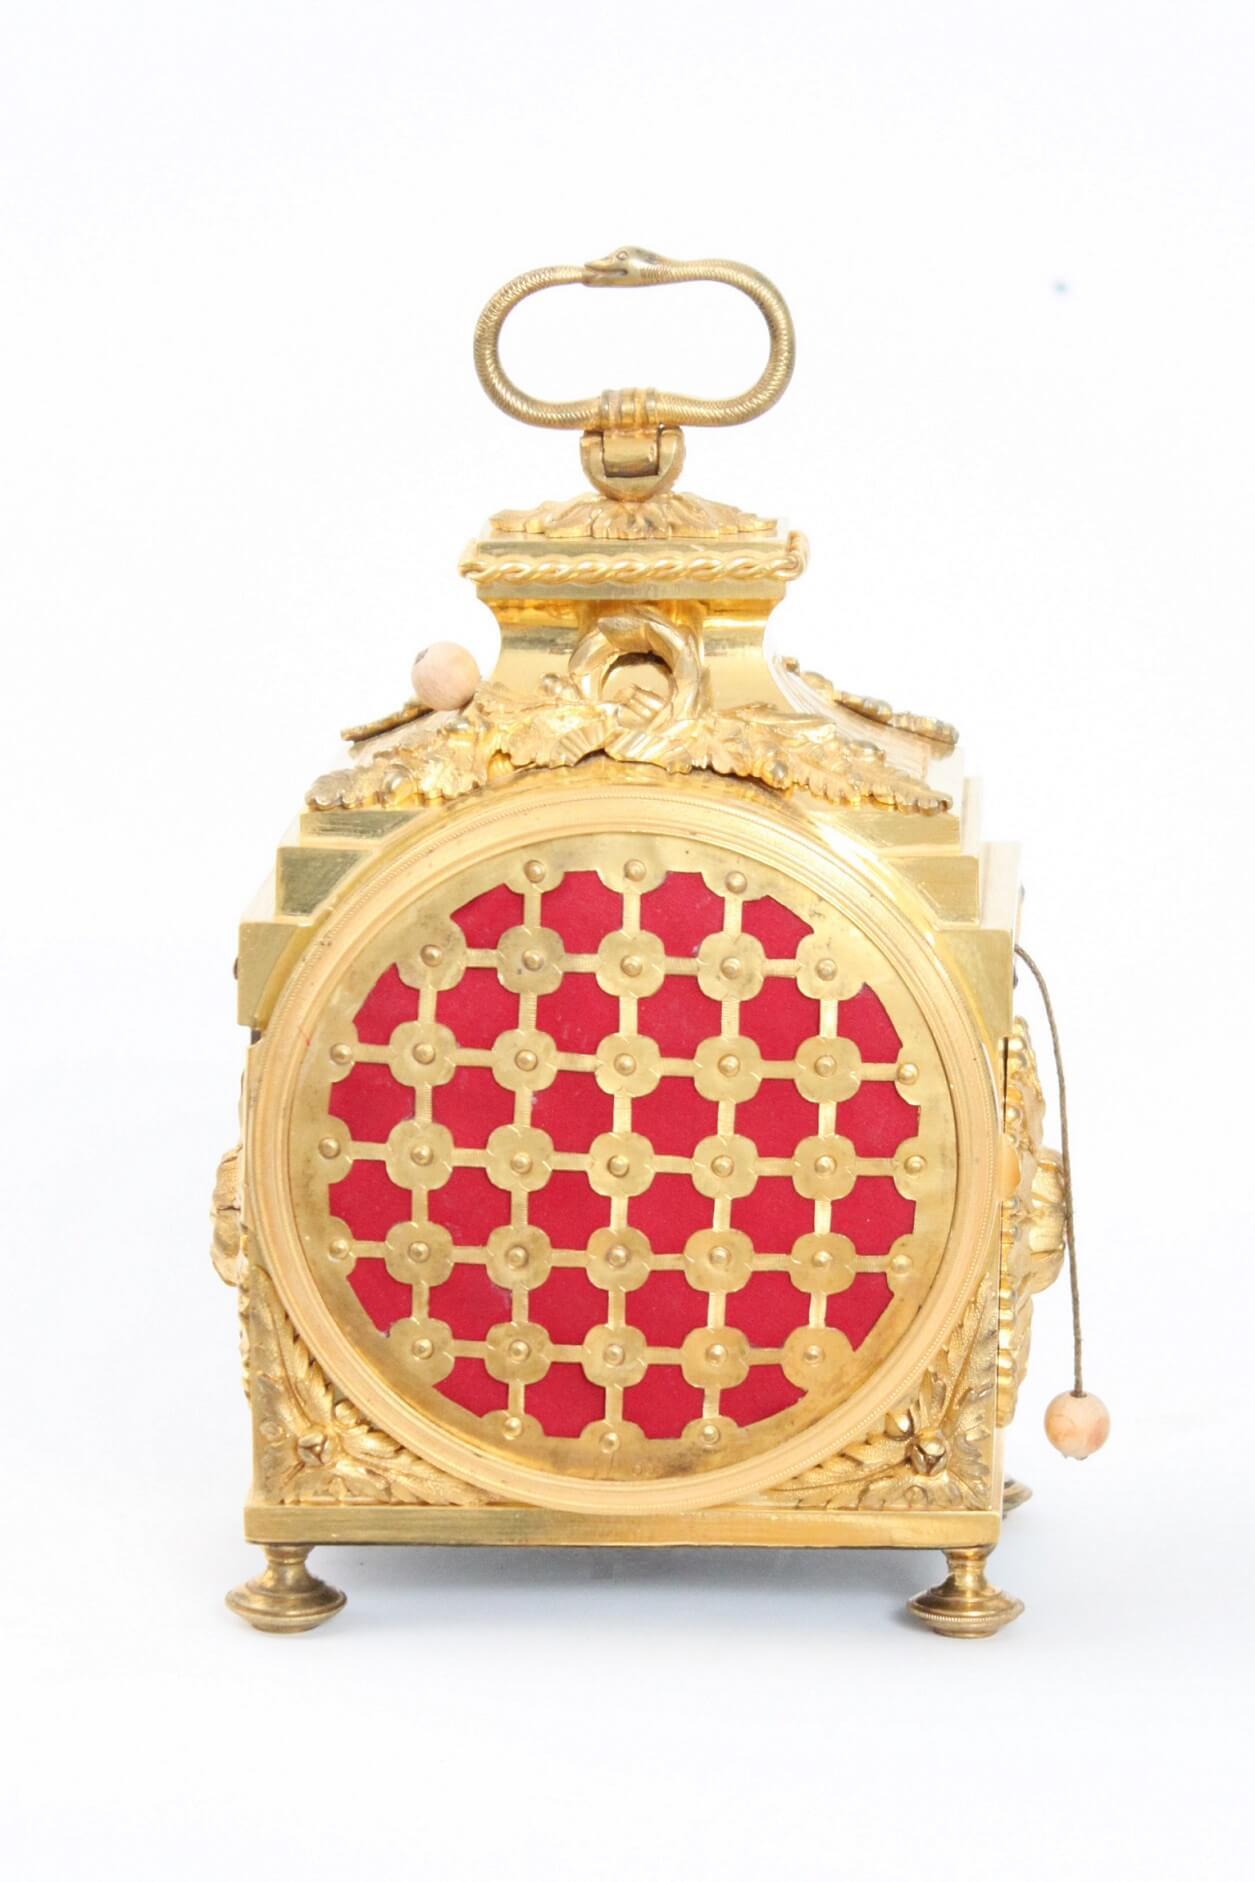 Swiss-French-ormolu-gilt-bronze-Louis XVI-pendule-officier-travel-antique-clock-Robert-Courvoisier-